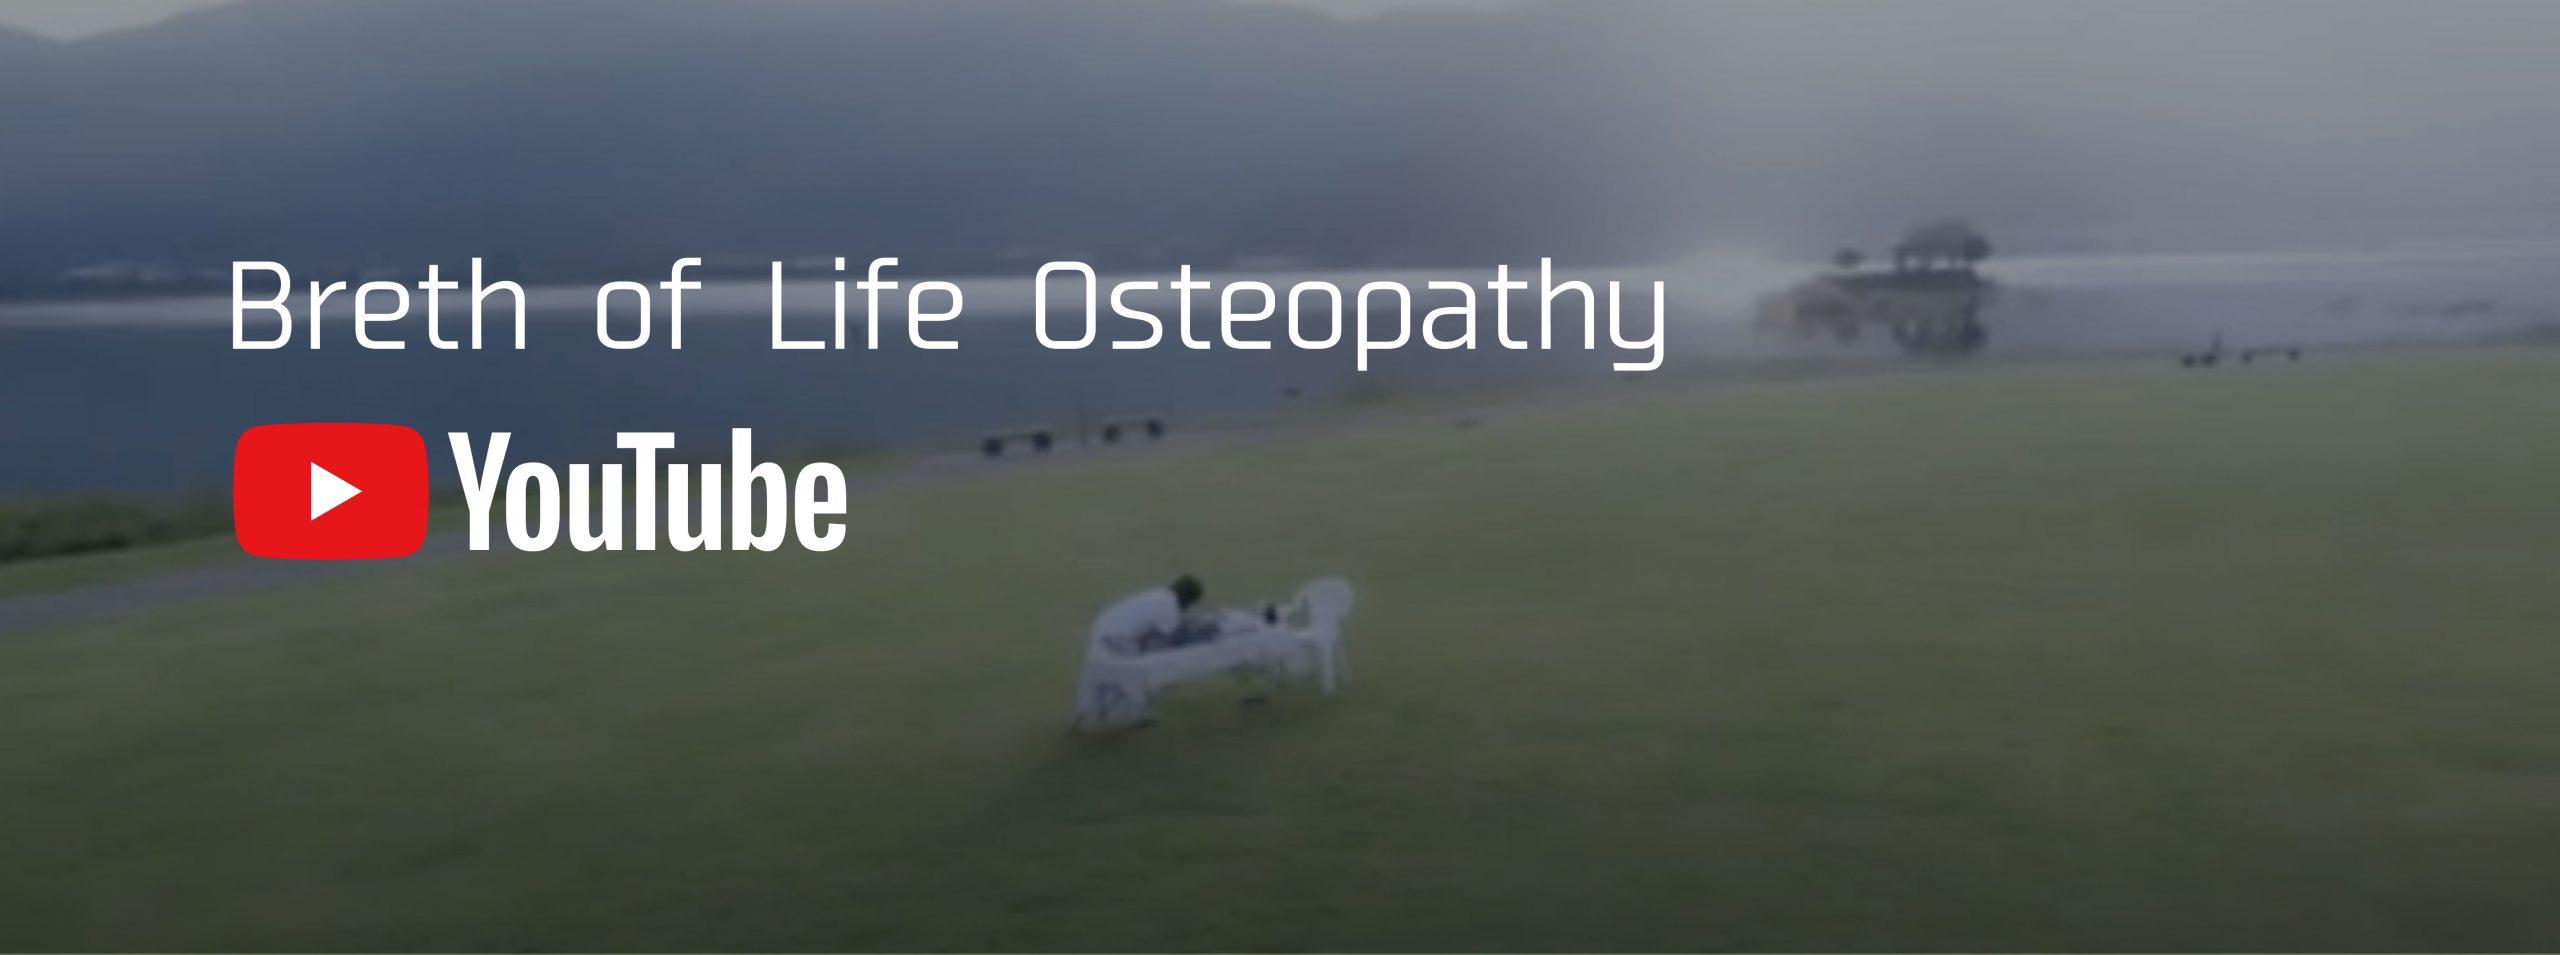 Osteopathy Image Movie